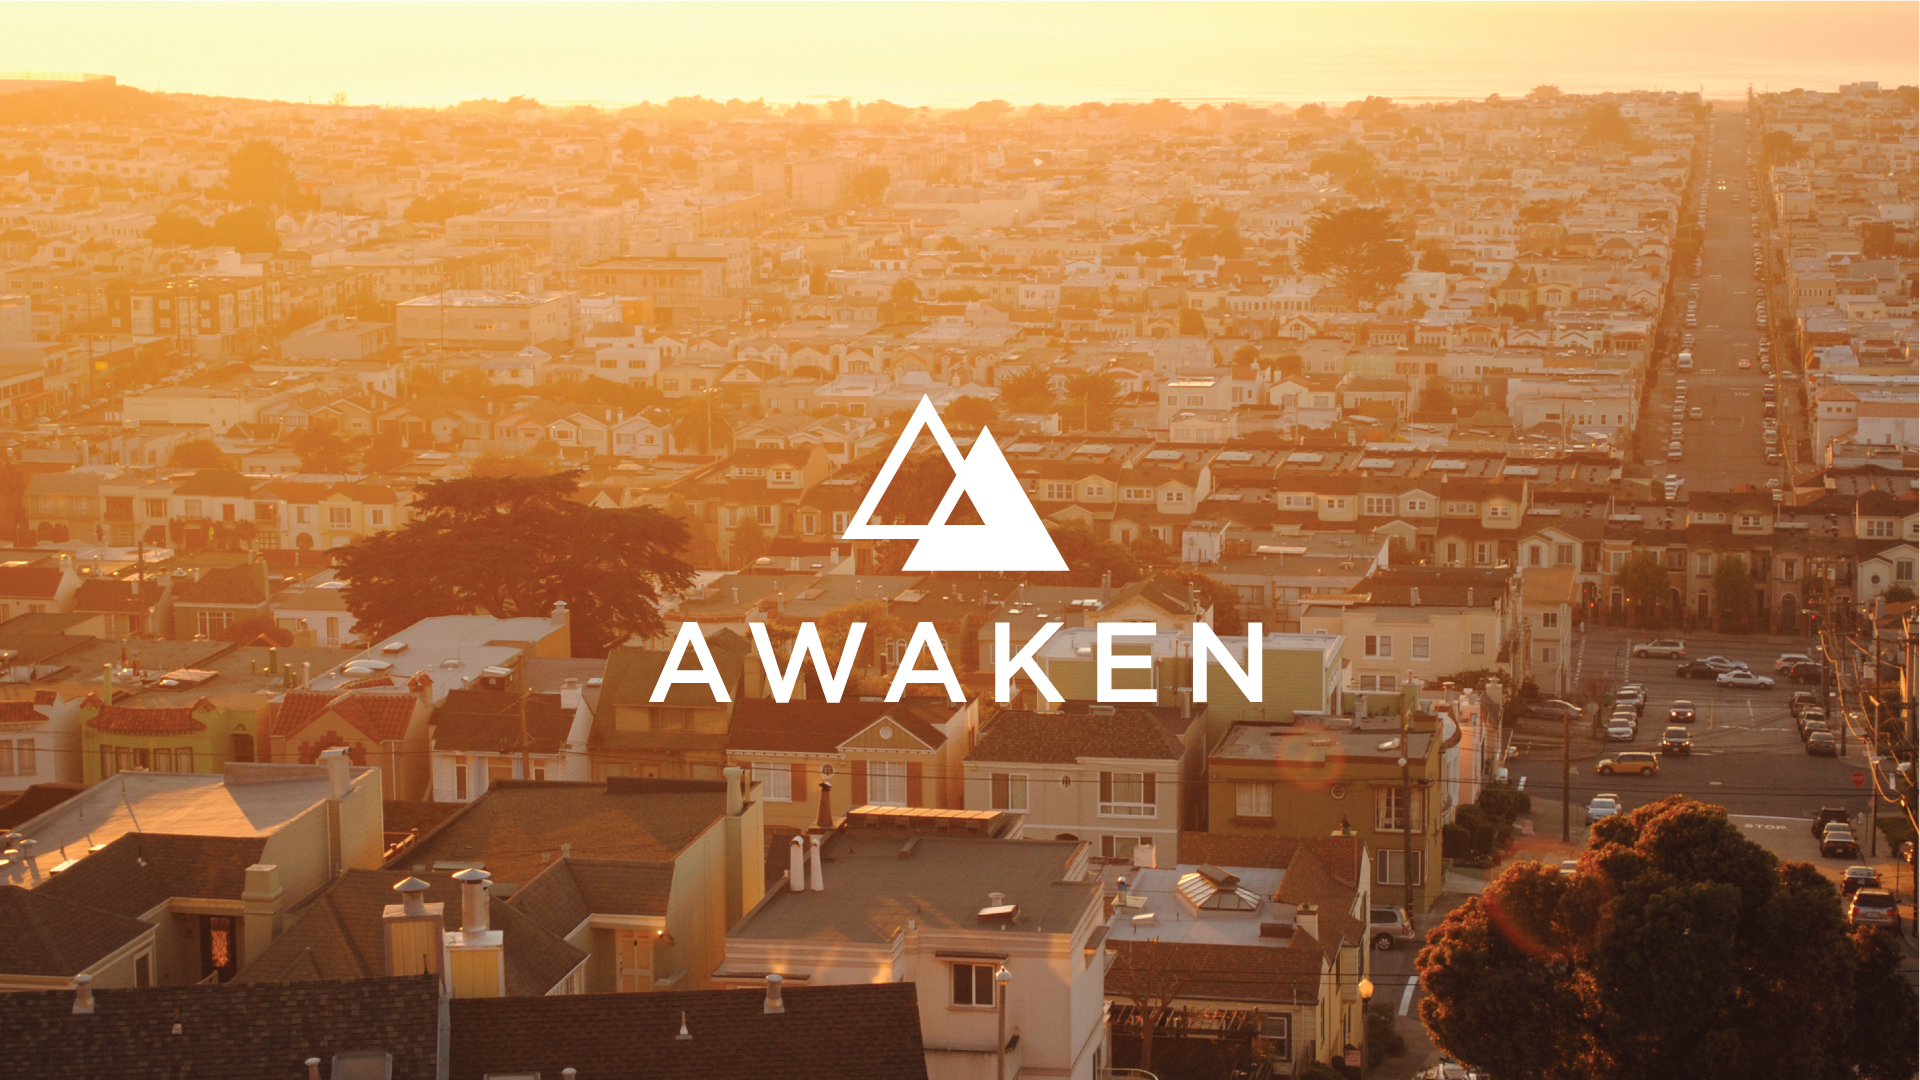 Awaken_Video.jpg